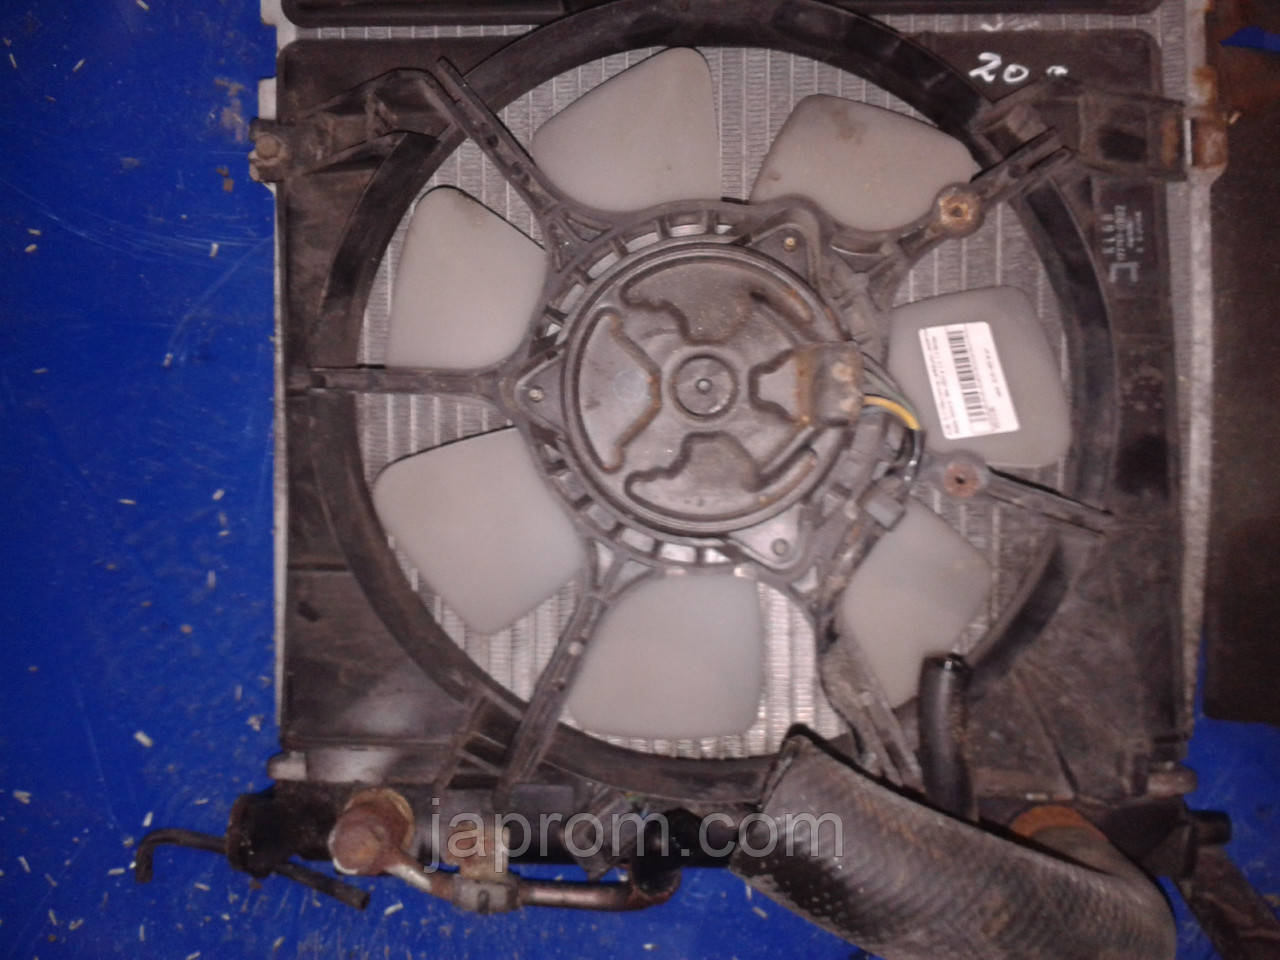 Вентилятор (диффузор) радиатора Mazda Xedos 9 1994-2002г.в. 2.0, 2.5 бензин